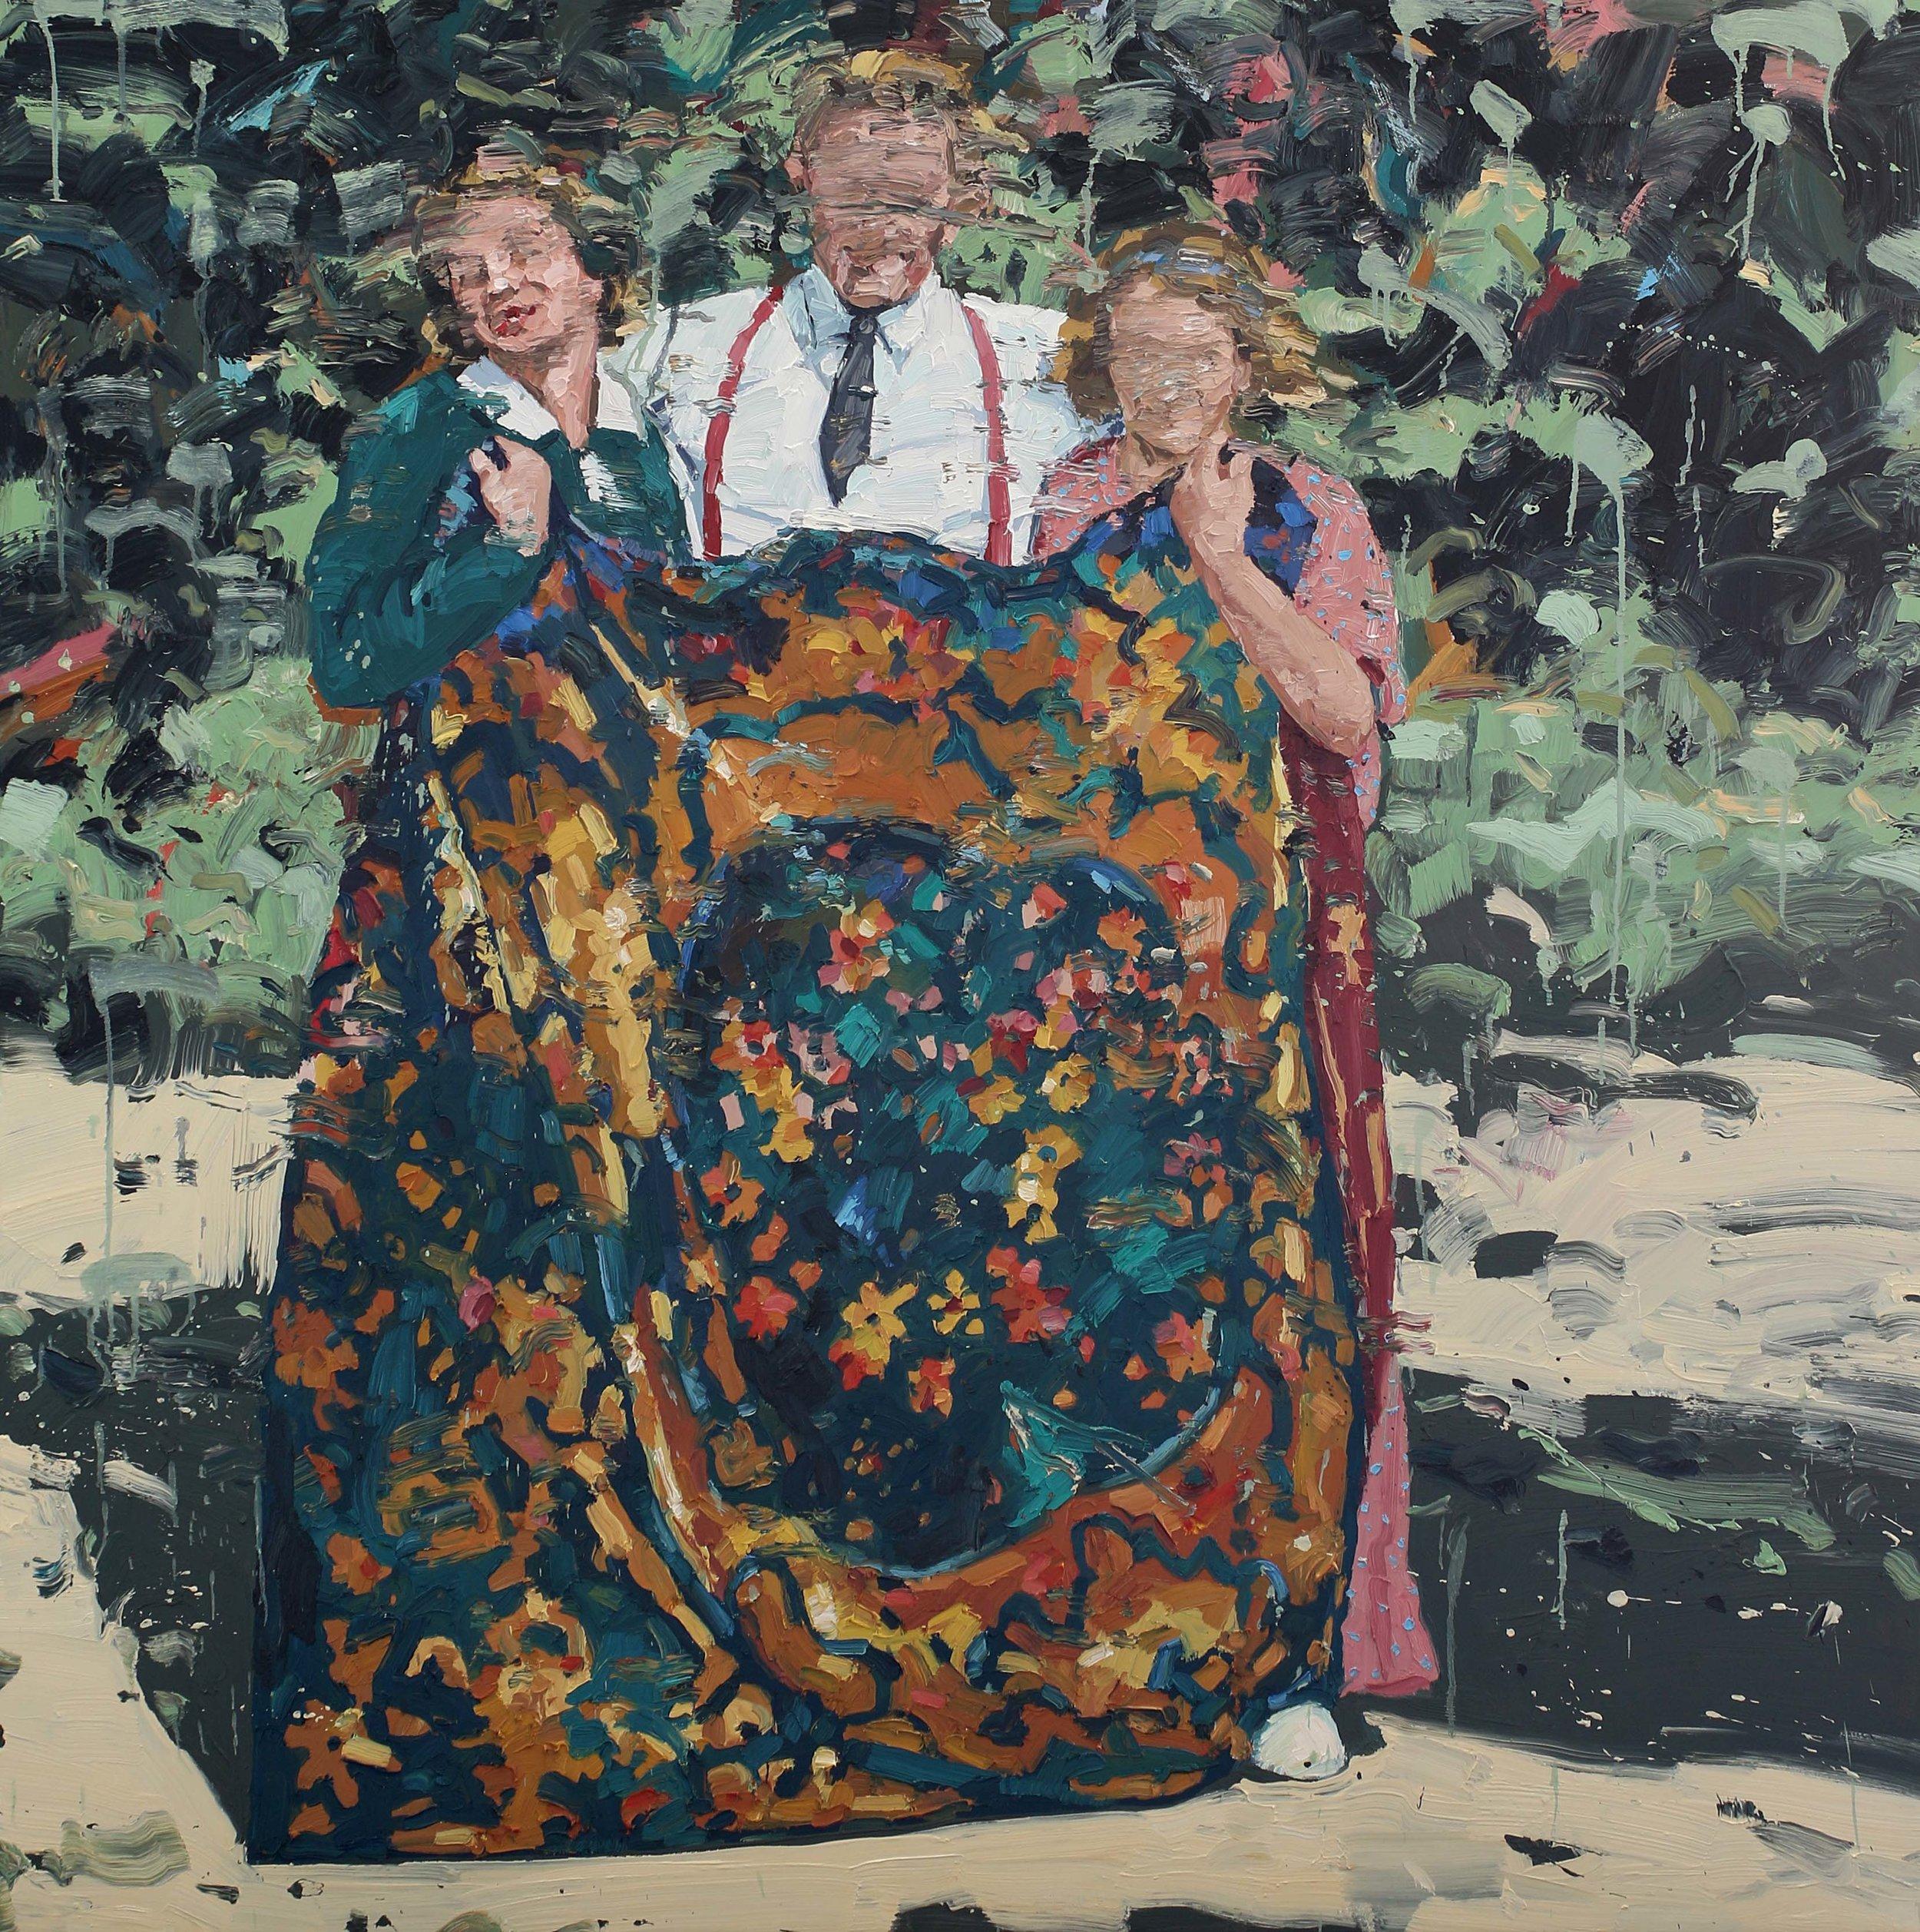 Mann med to damer og et teppe – 150x150 cm – Eggoljetempera på lerret.  Galleri Grette